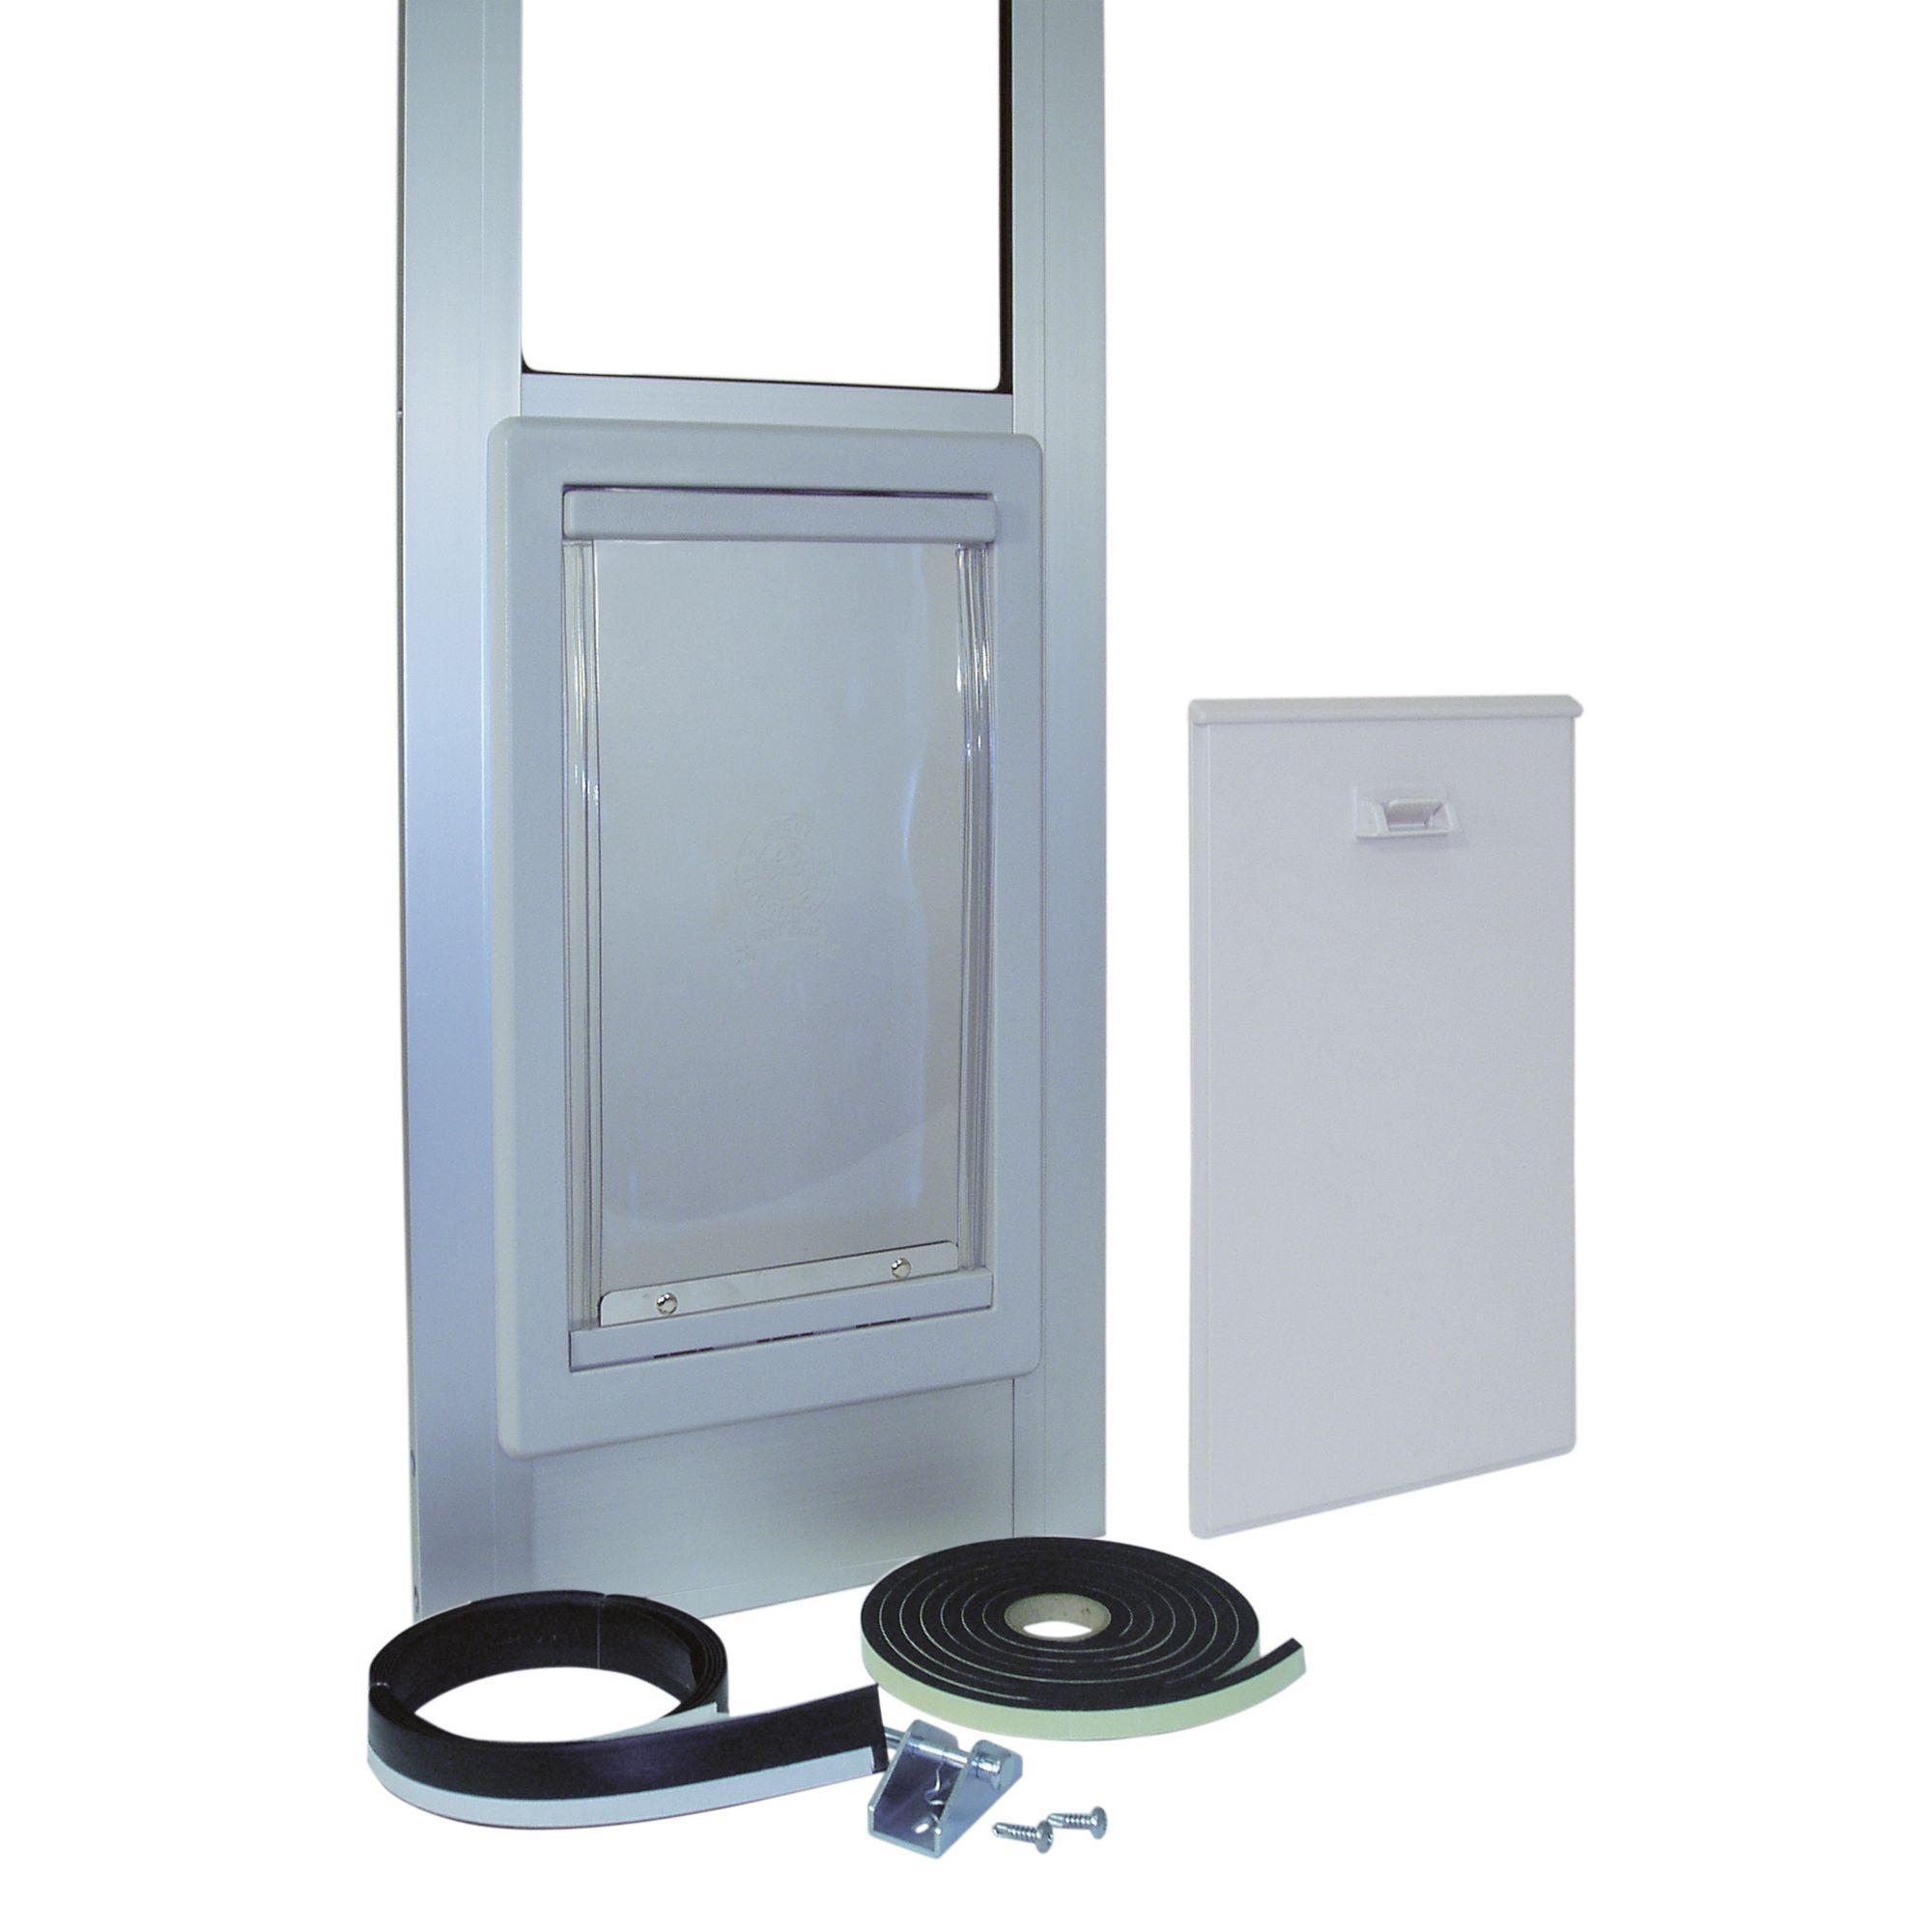 Ideal Pet Products Modular Patio Pet Door Size X Large Mill